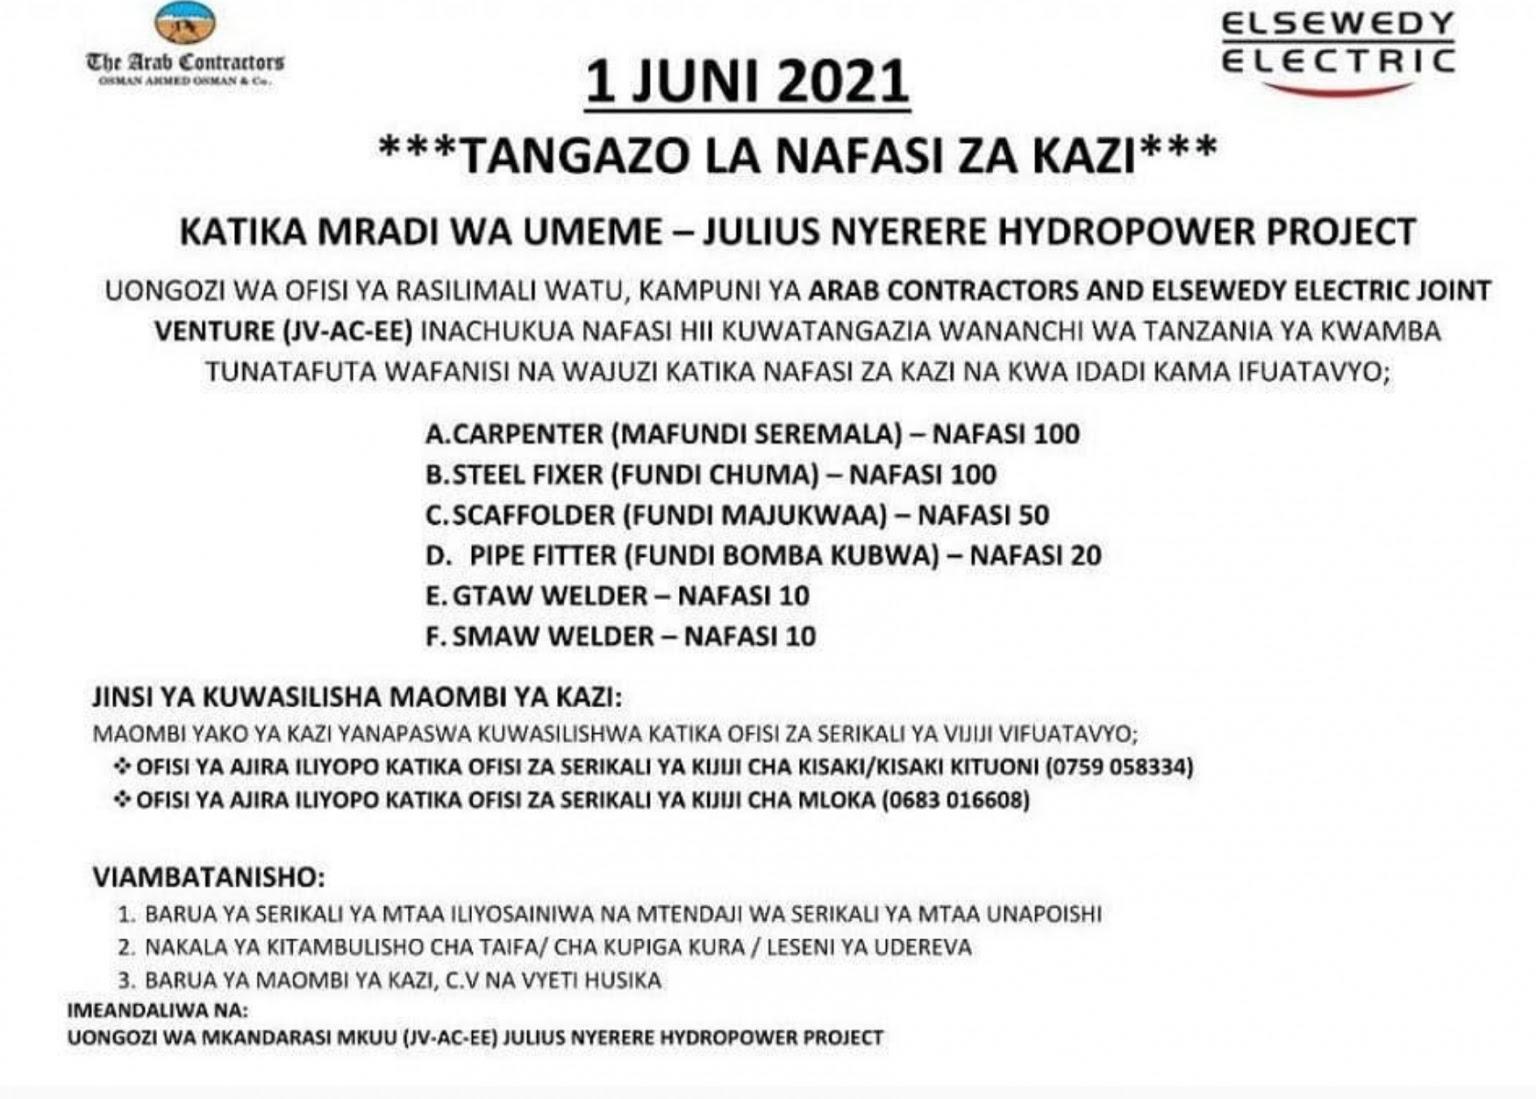 290 Various Jobs ufundi at JVACEE Stiglers Gorge Project June 2021